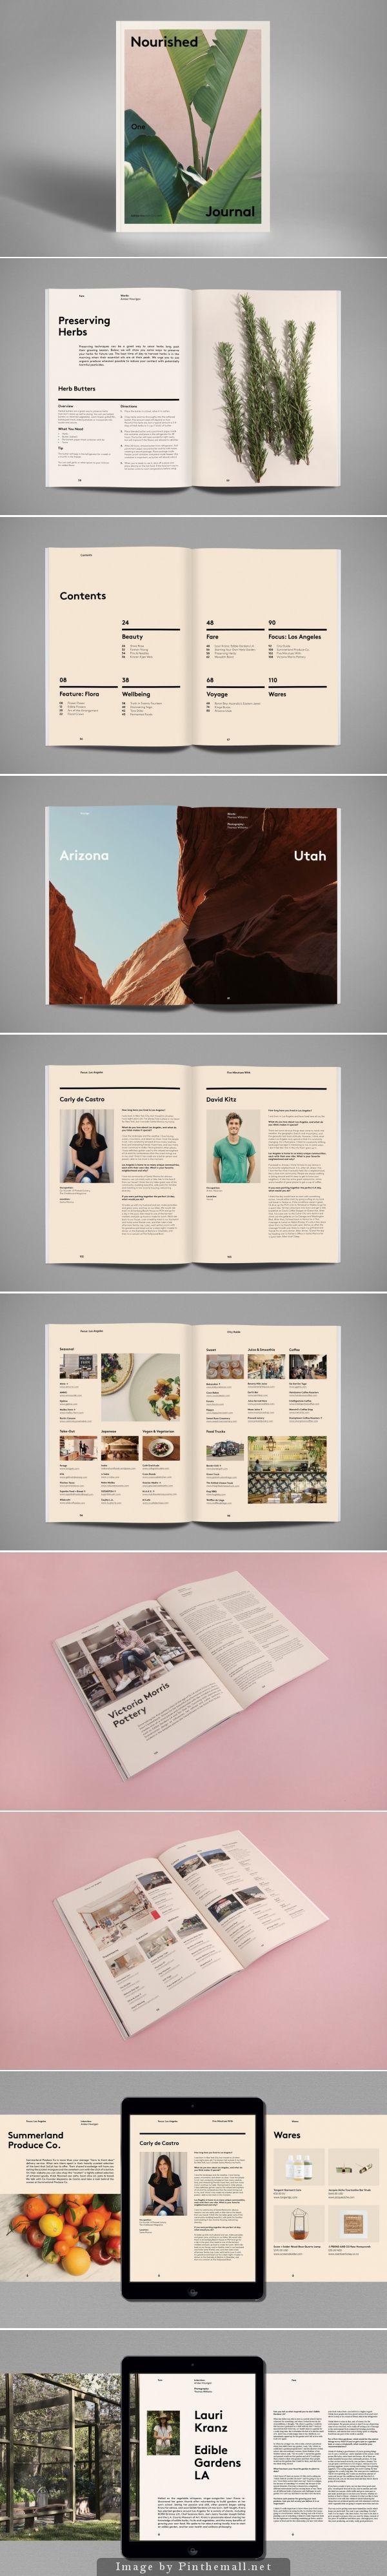 Graphic Design Ideas - Nourished Journal